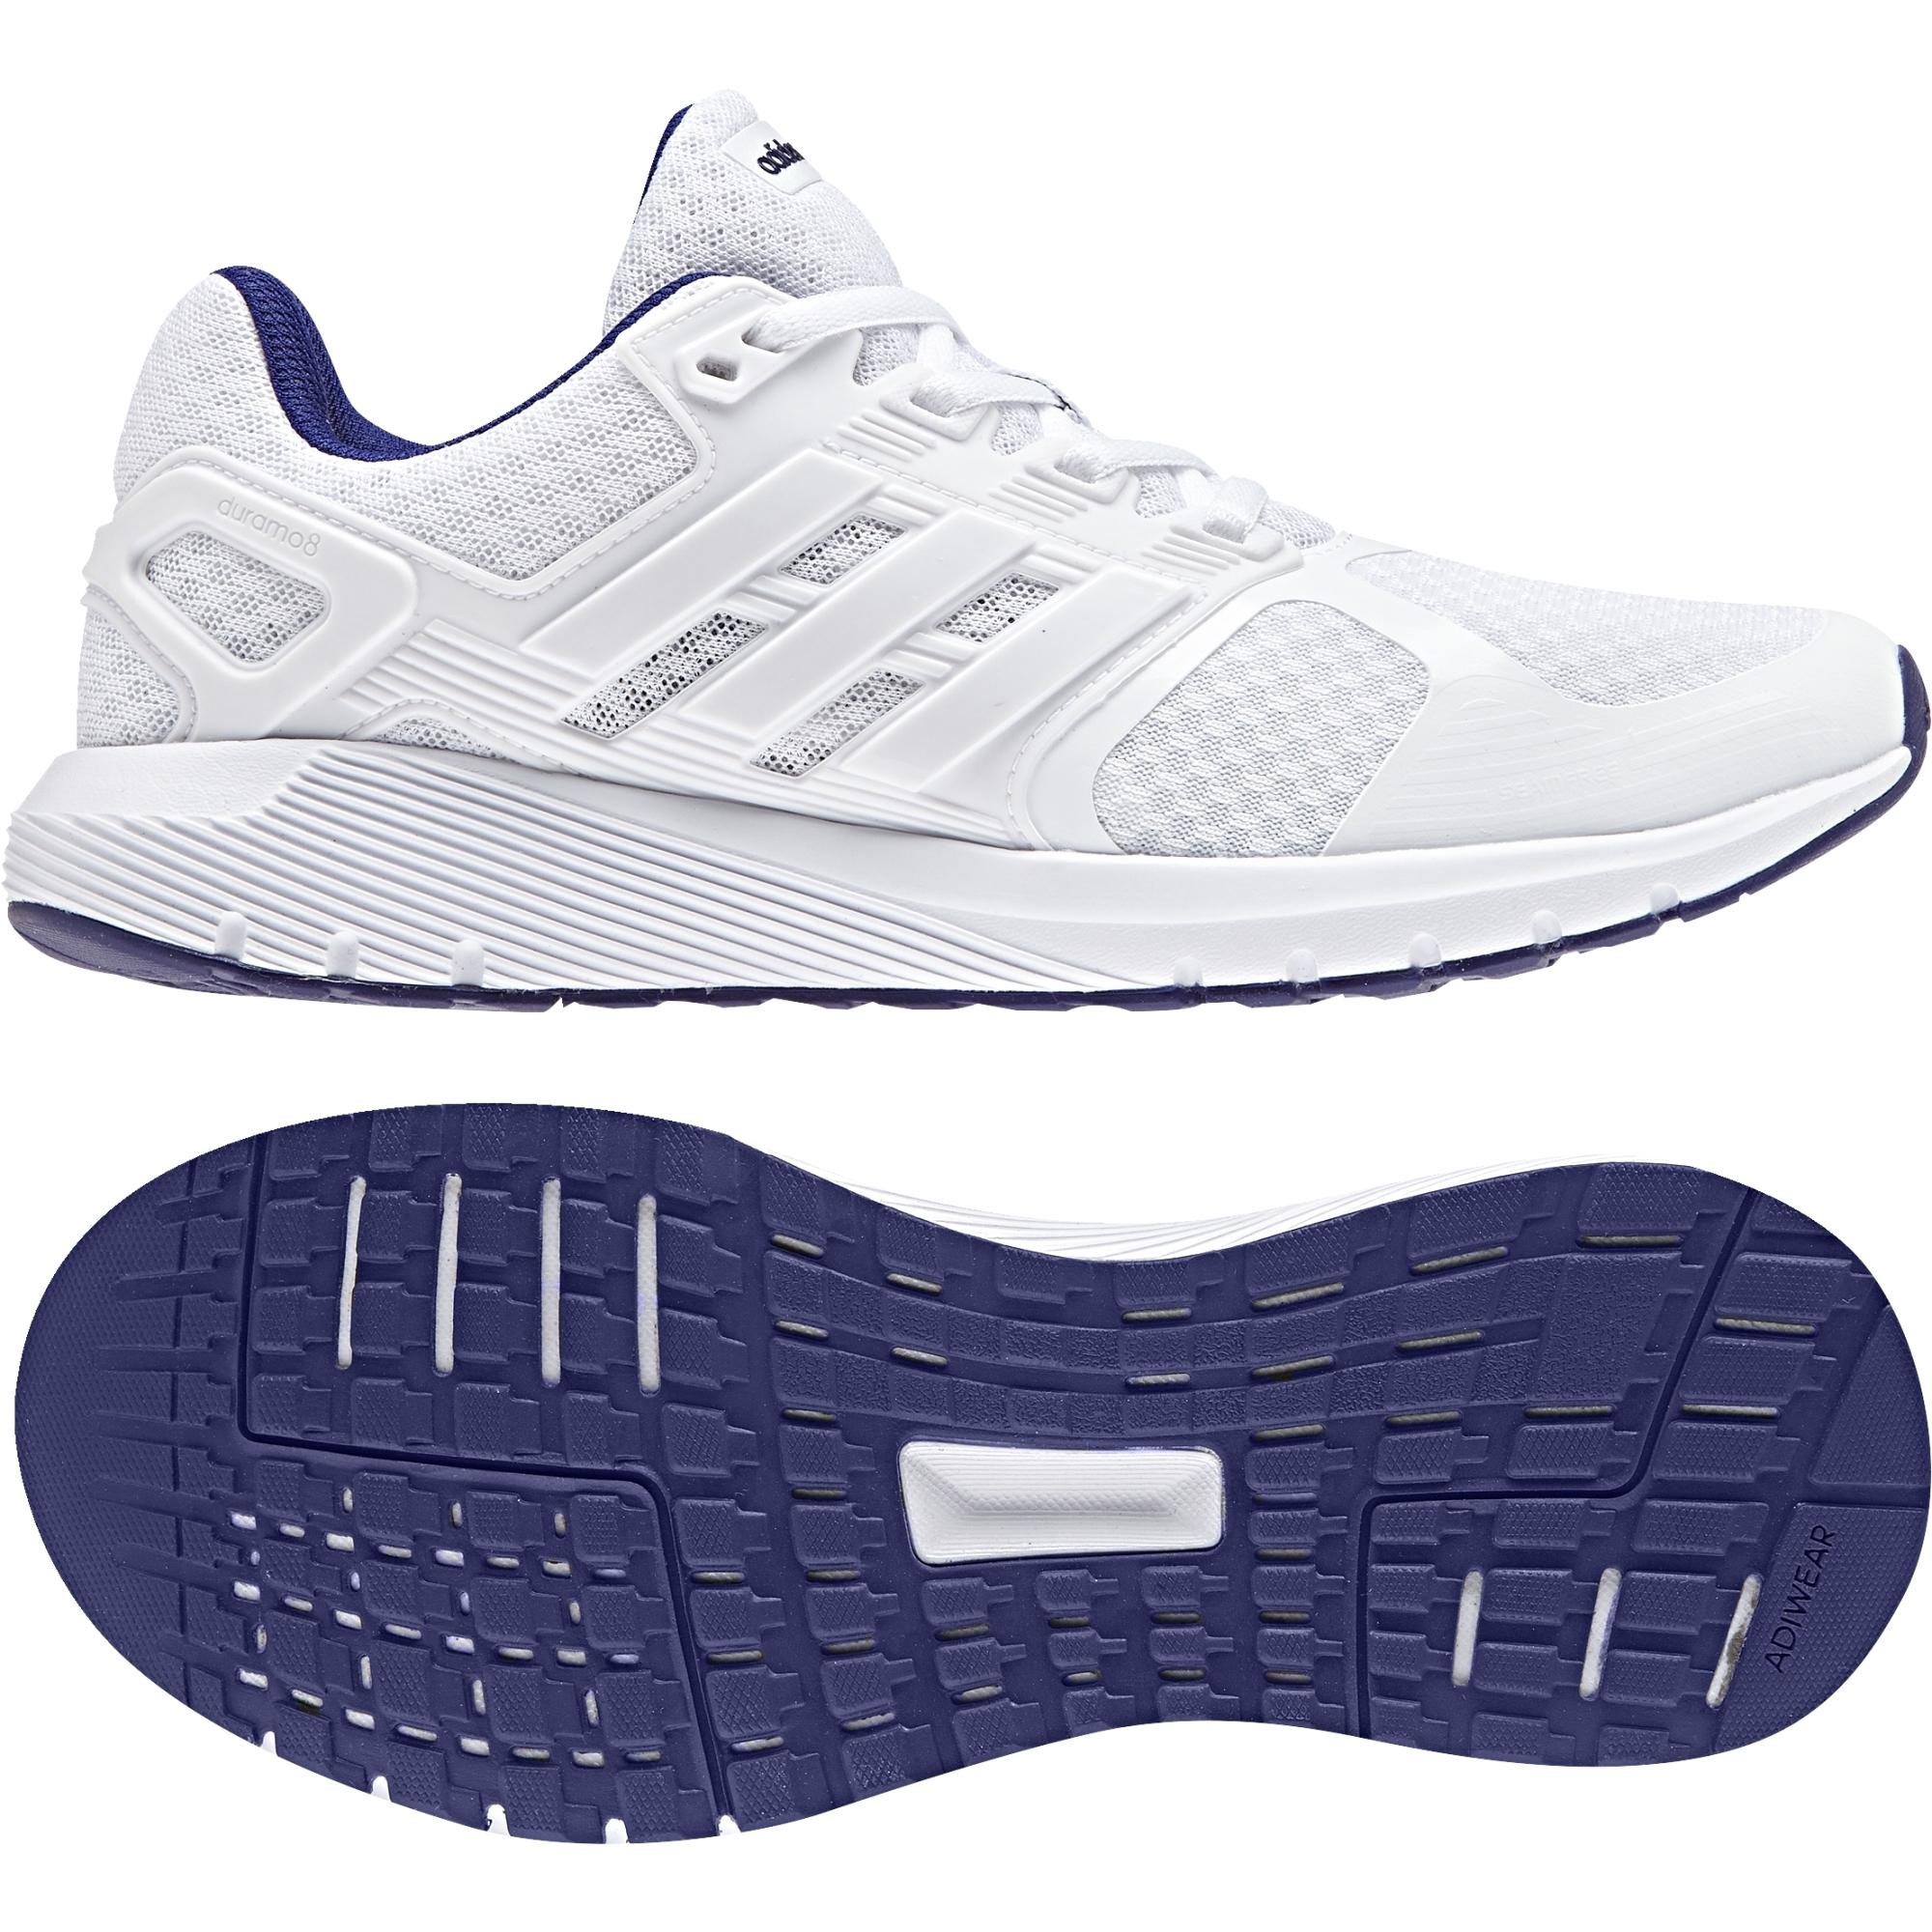 femme adidas 8 femme Chaussures Duramo Chaussures adidas